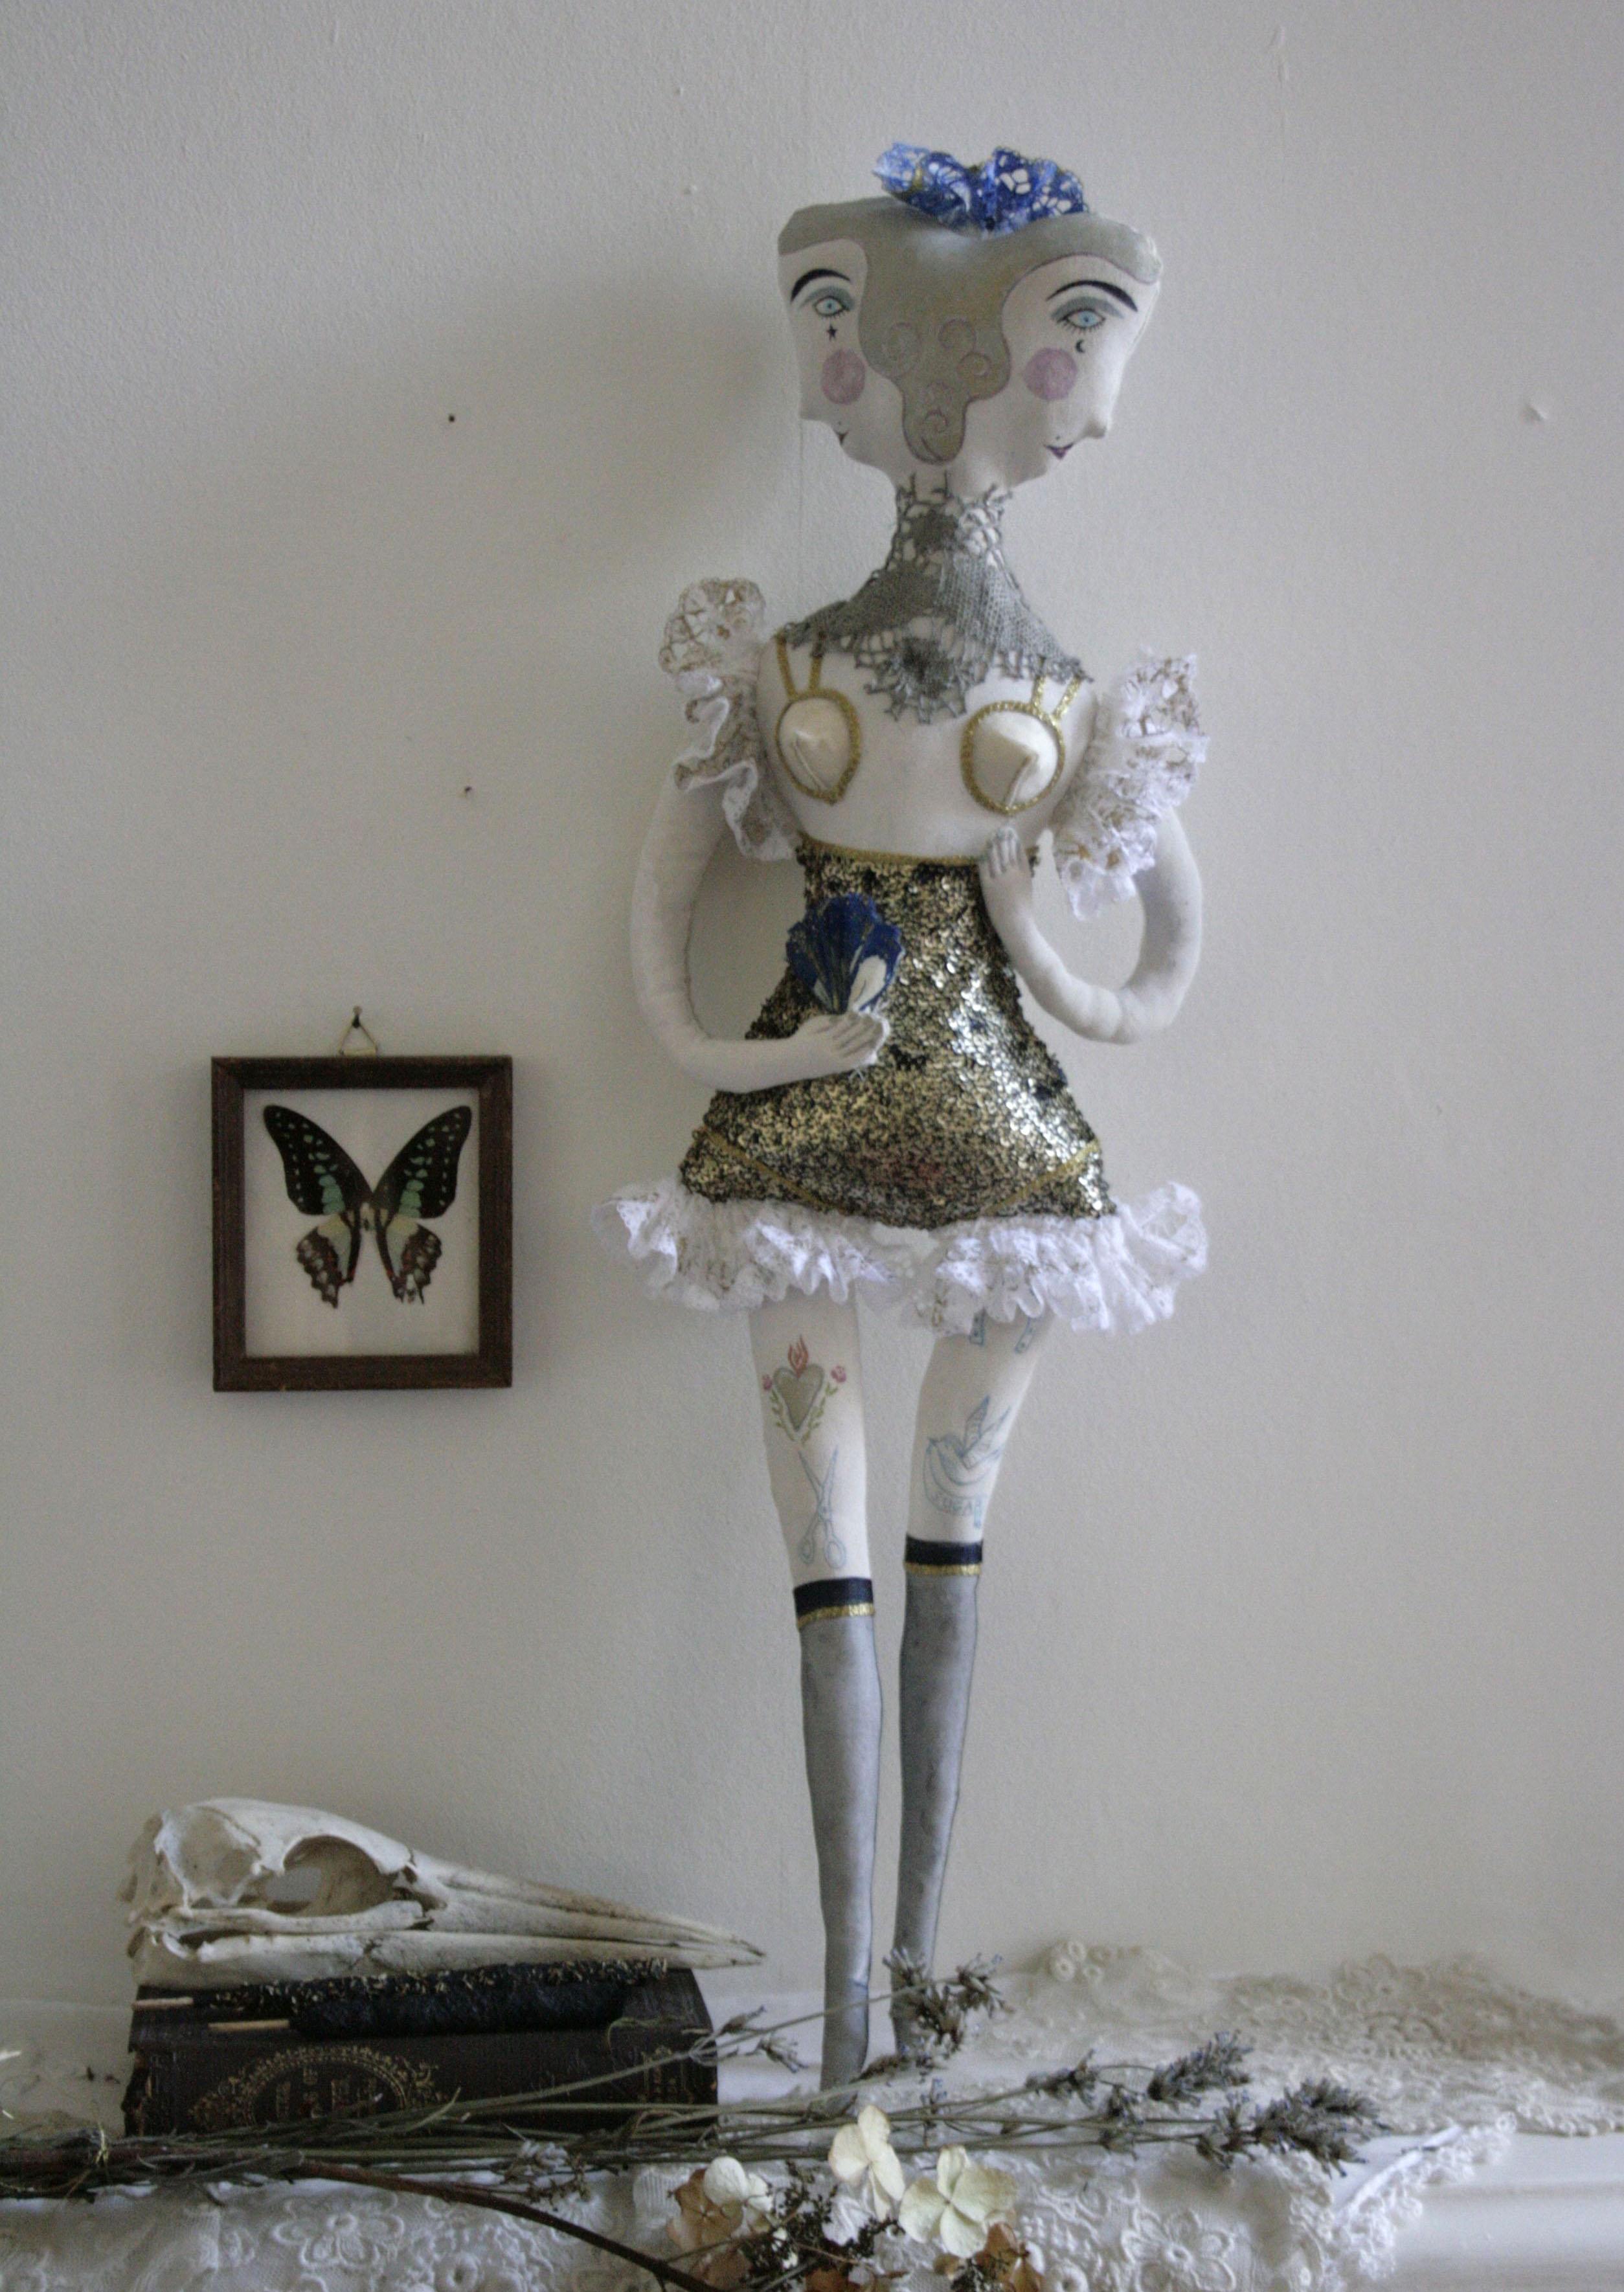 burlesque doll